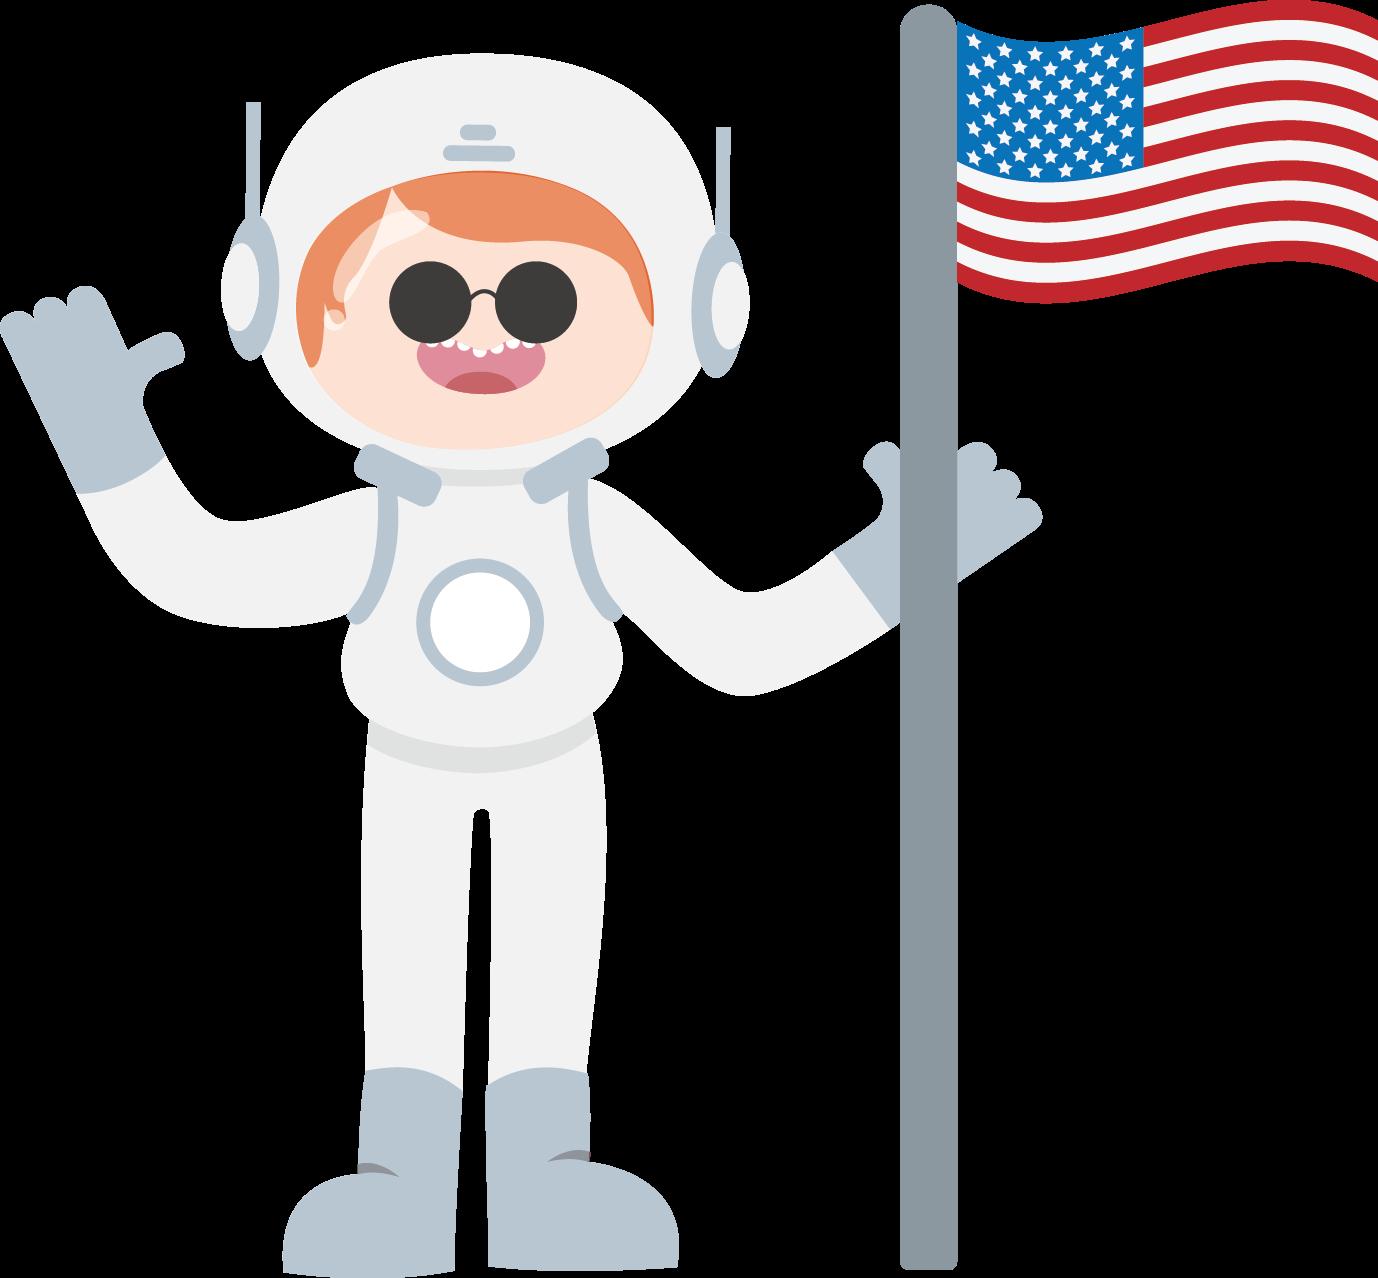 Astronot-US-Jagoan-Hosting-